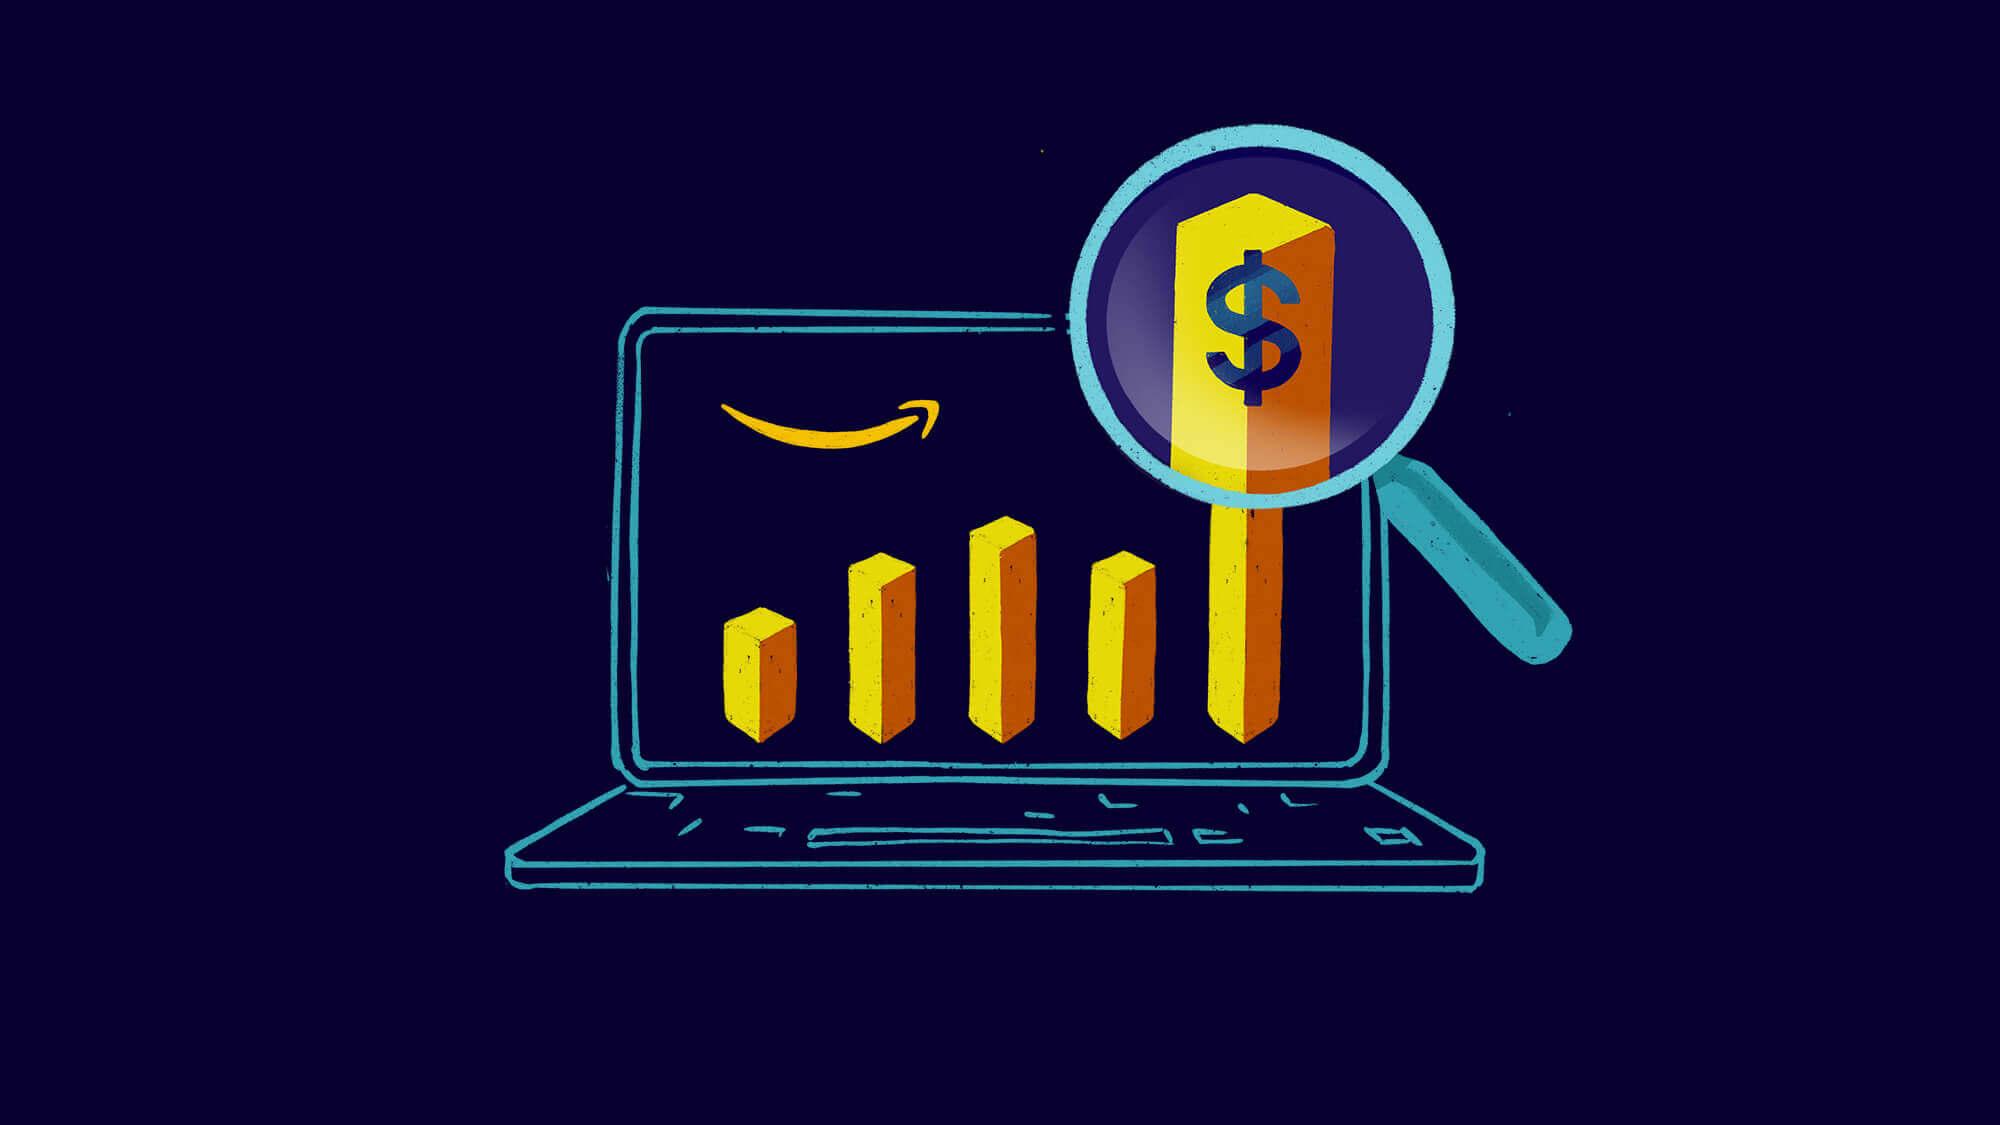 Website Optimization and Amazon SEO